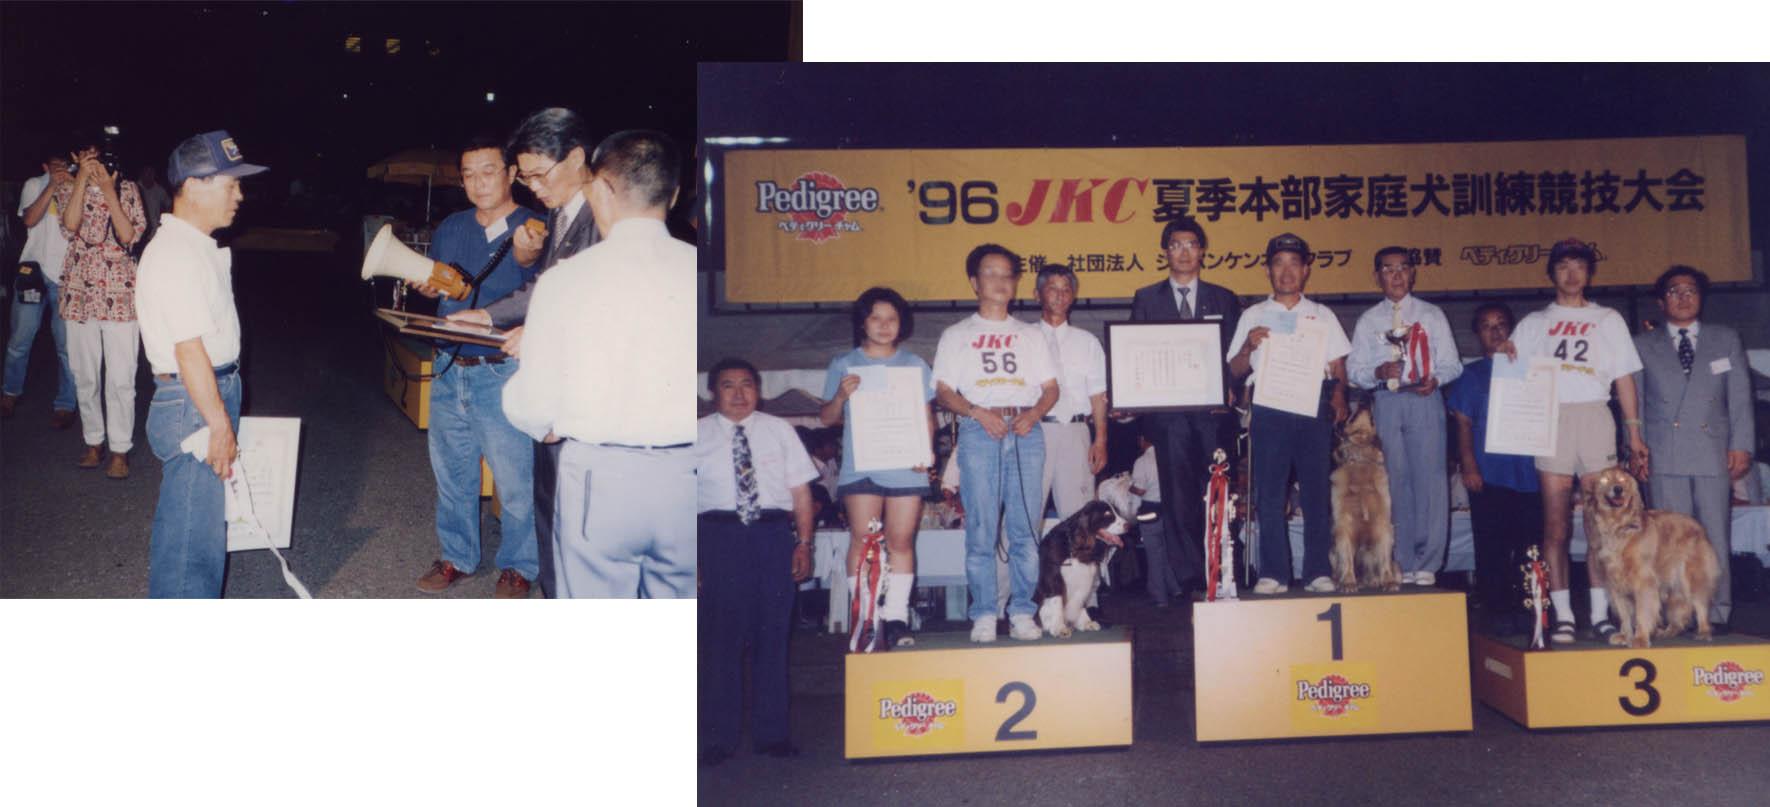 1996年JKC夏季本部競技会の一場面